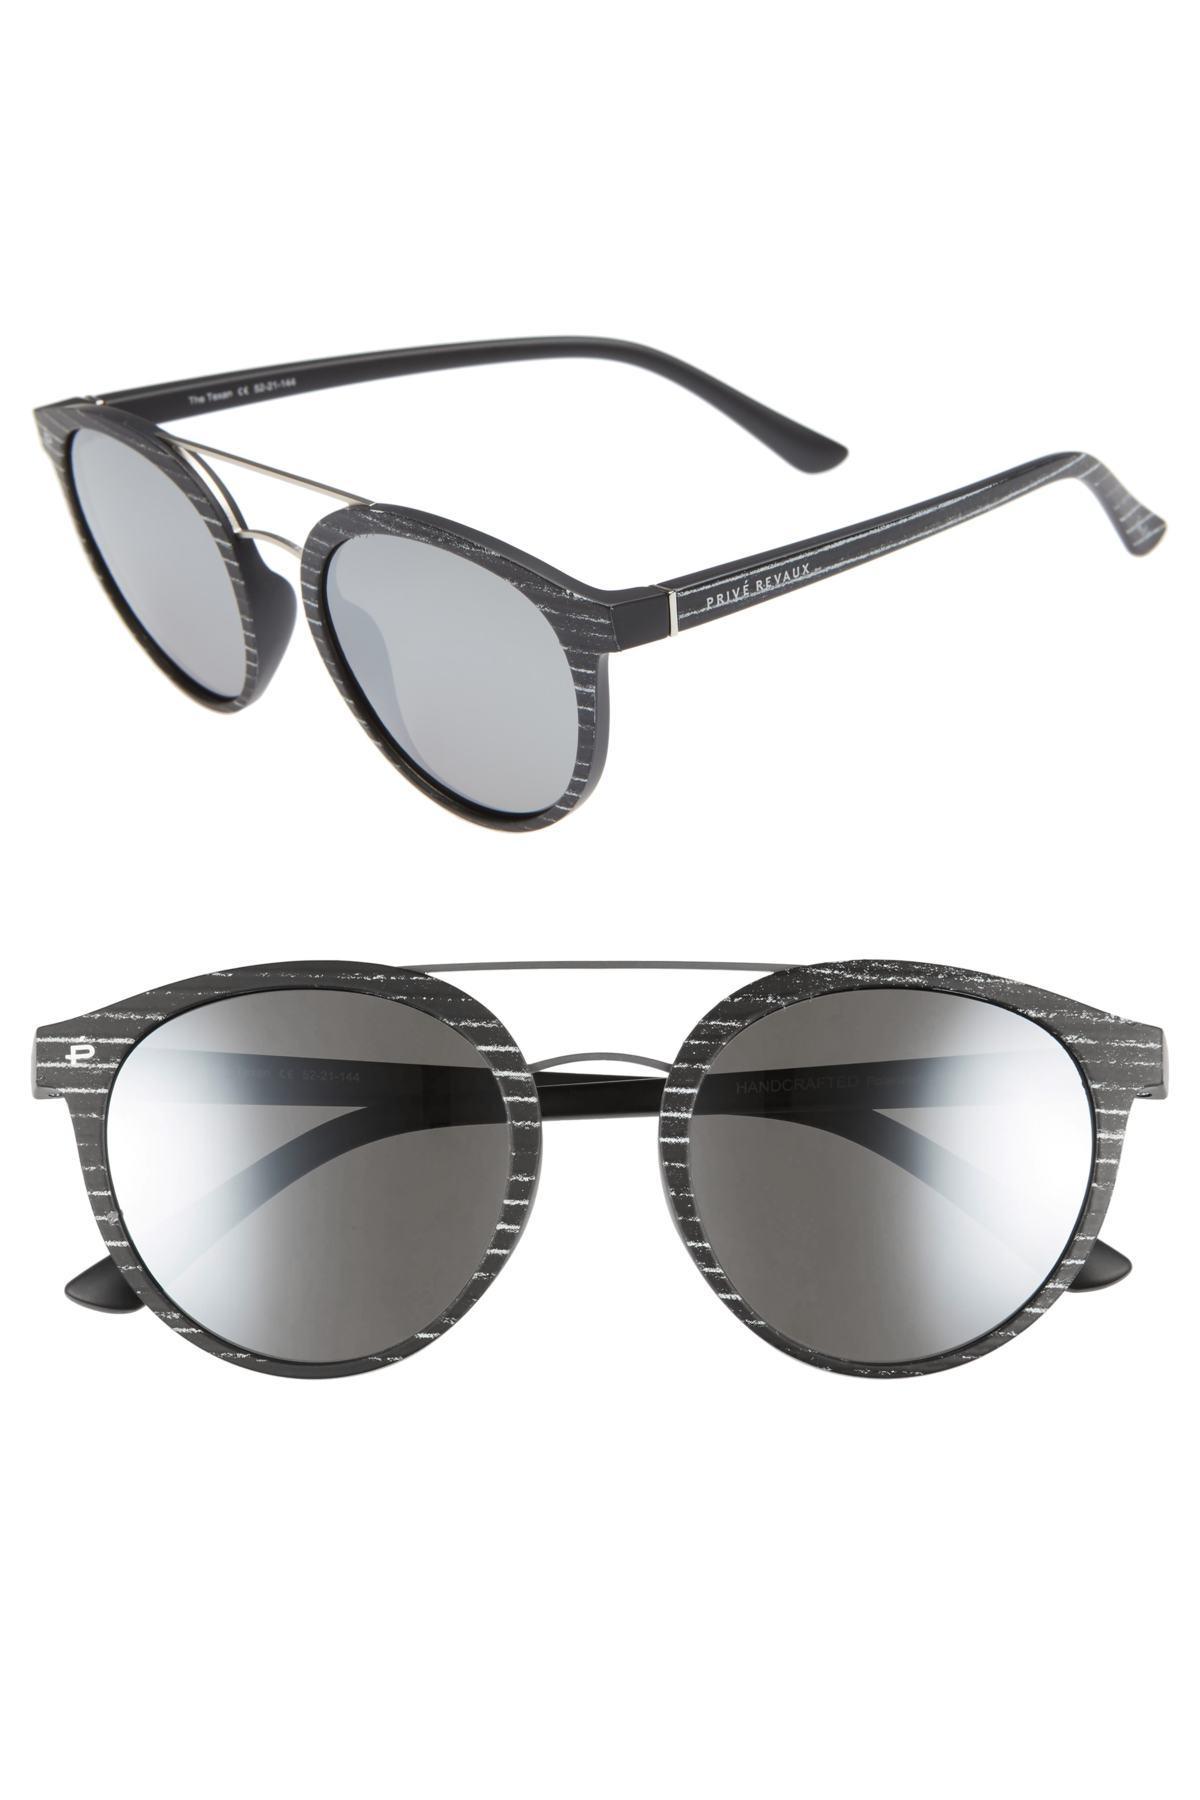 e547eaa6e45f Lyst - Privé Revaux The Texan 52mm Sunglasses in Black